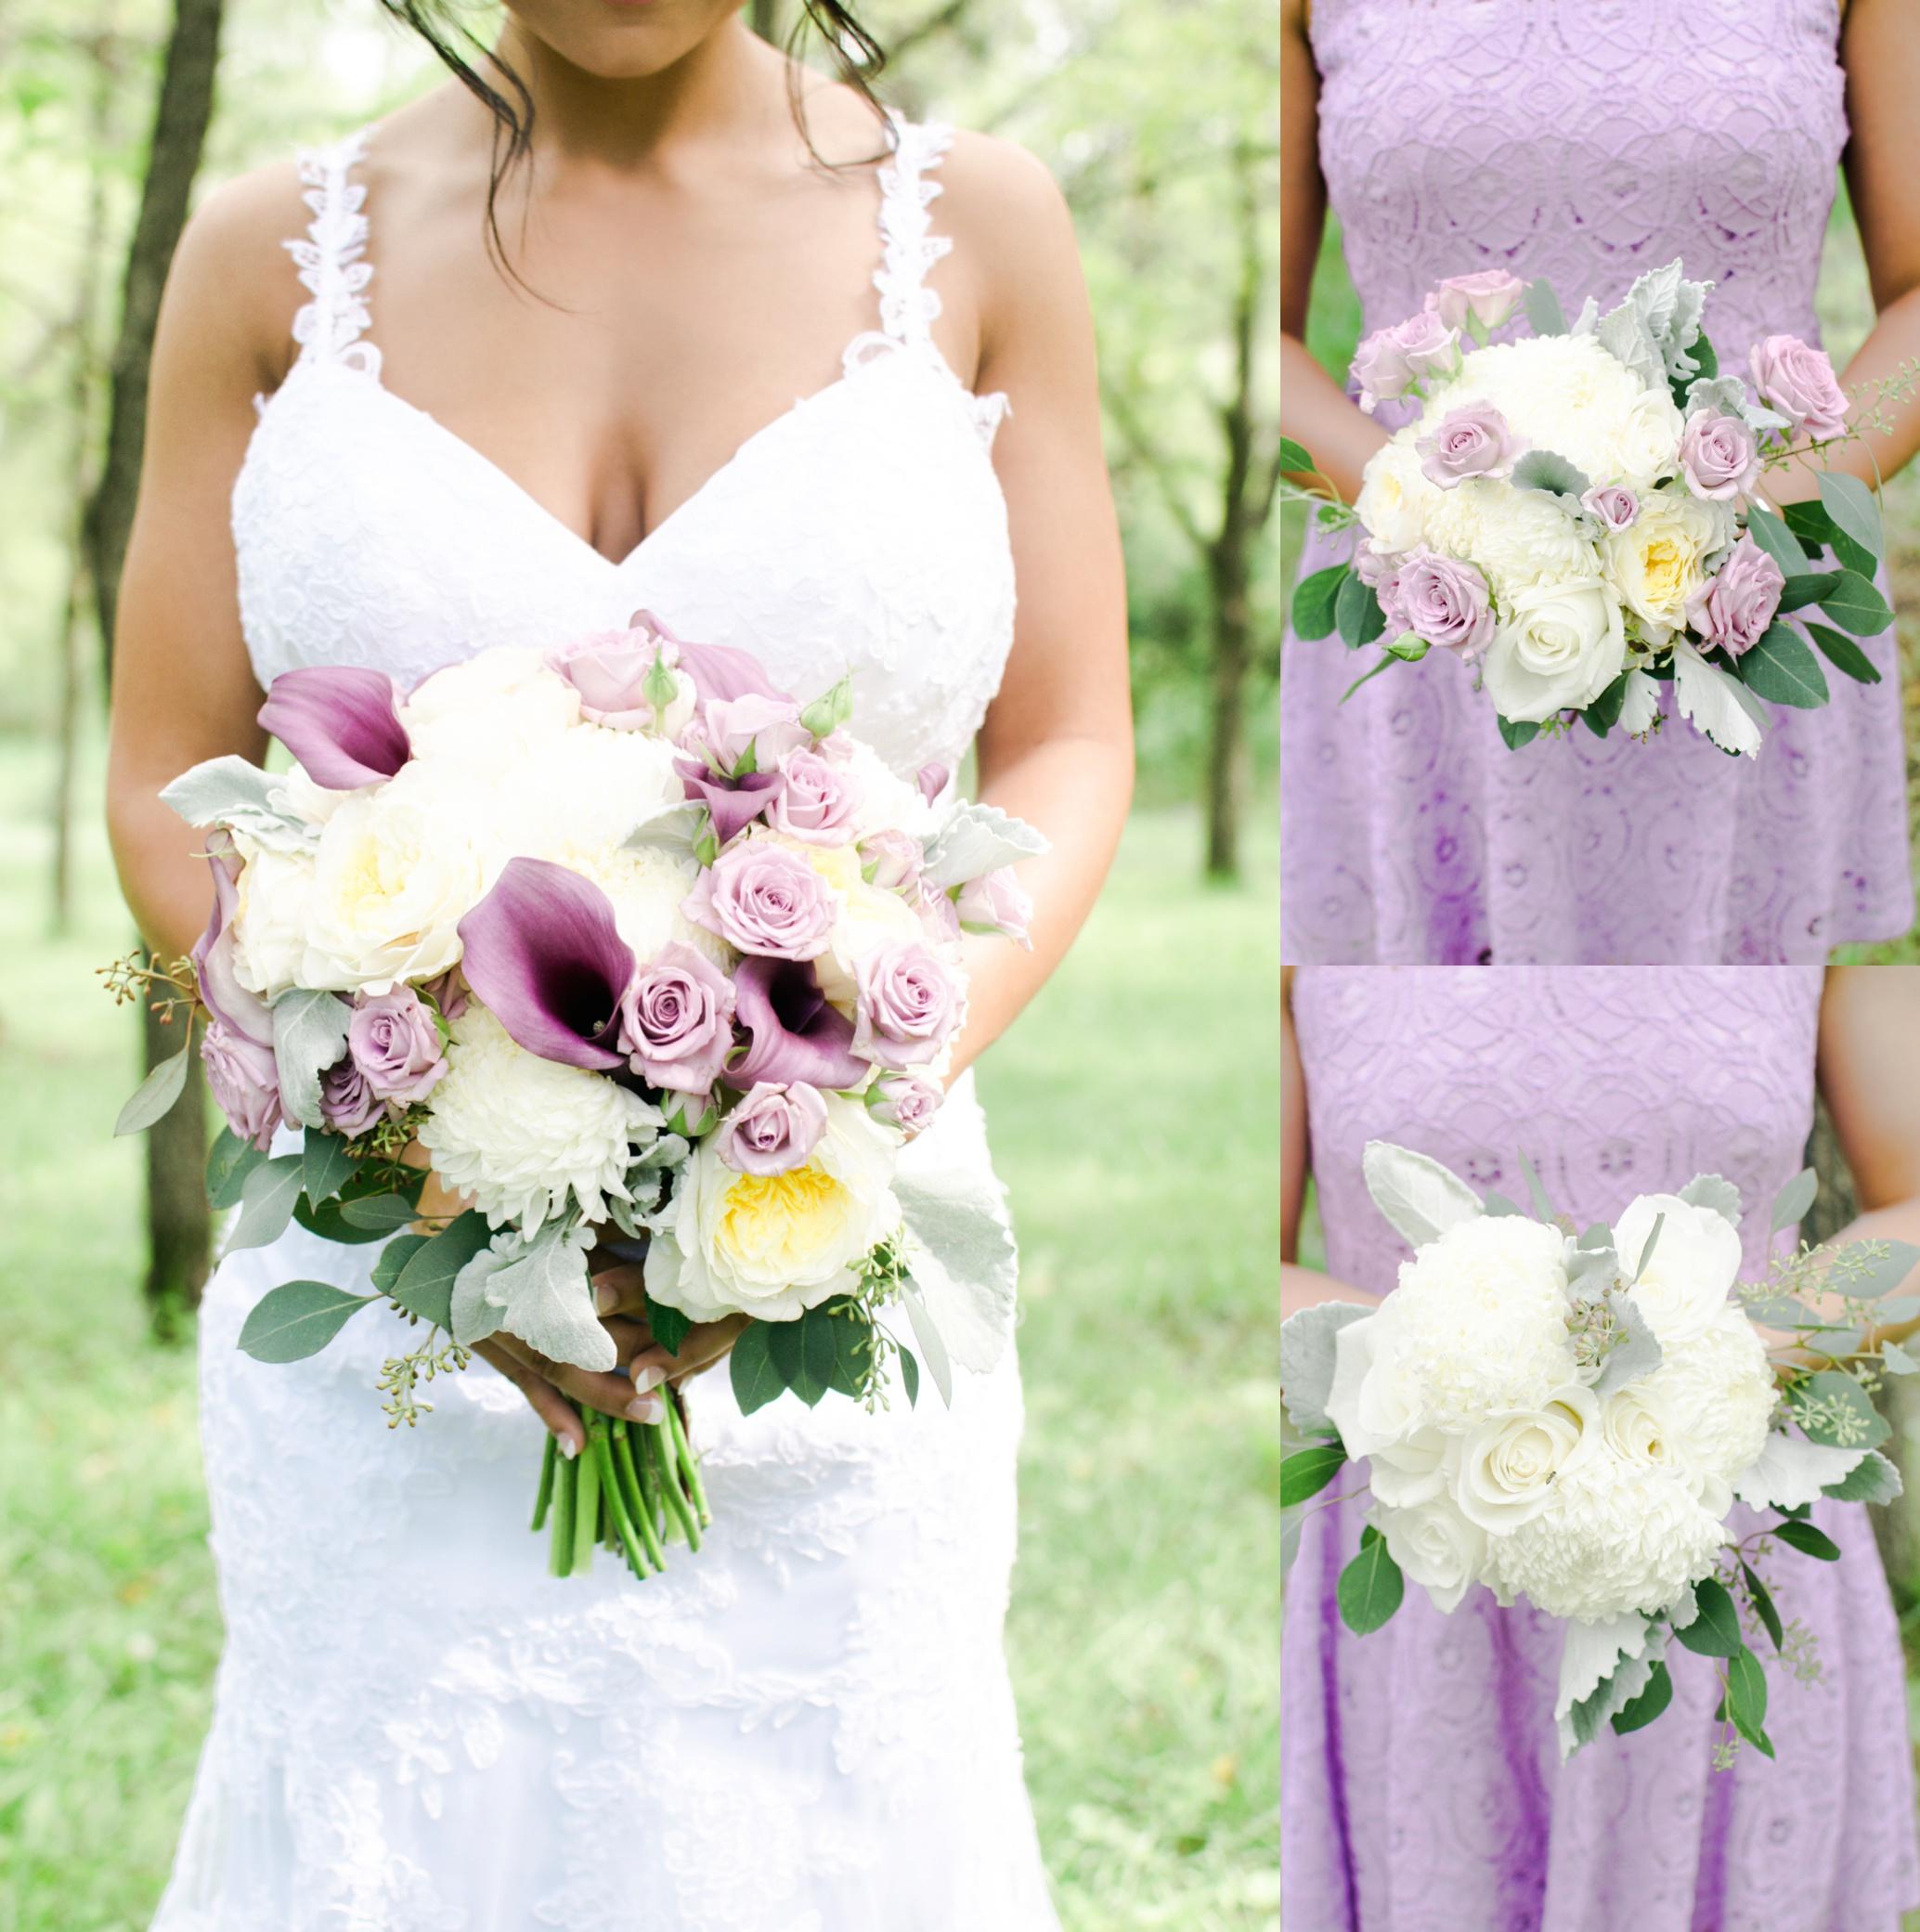 Barnes' Place Rustic Outdoor Wedding | Ali Leigh Photo Minneapolis Wedding Photographer_0117.jpg